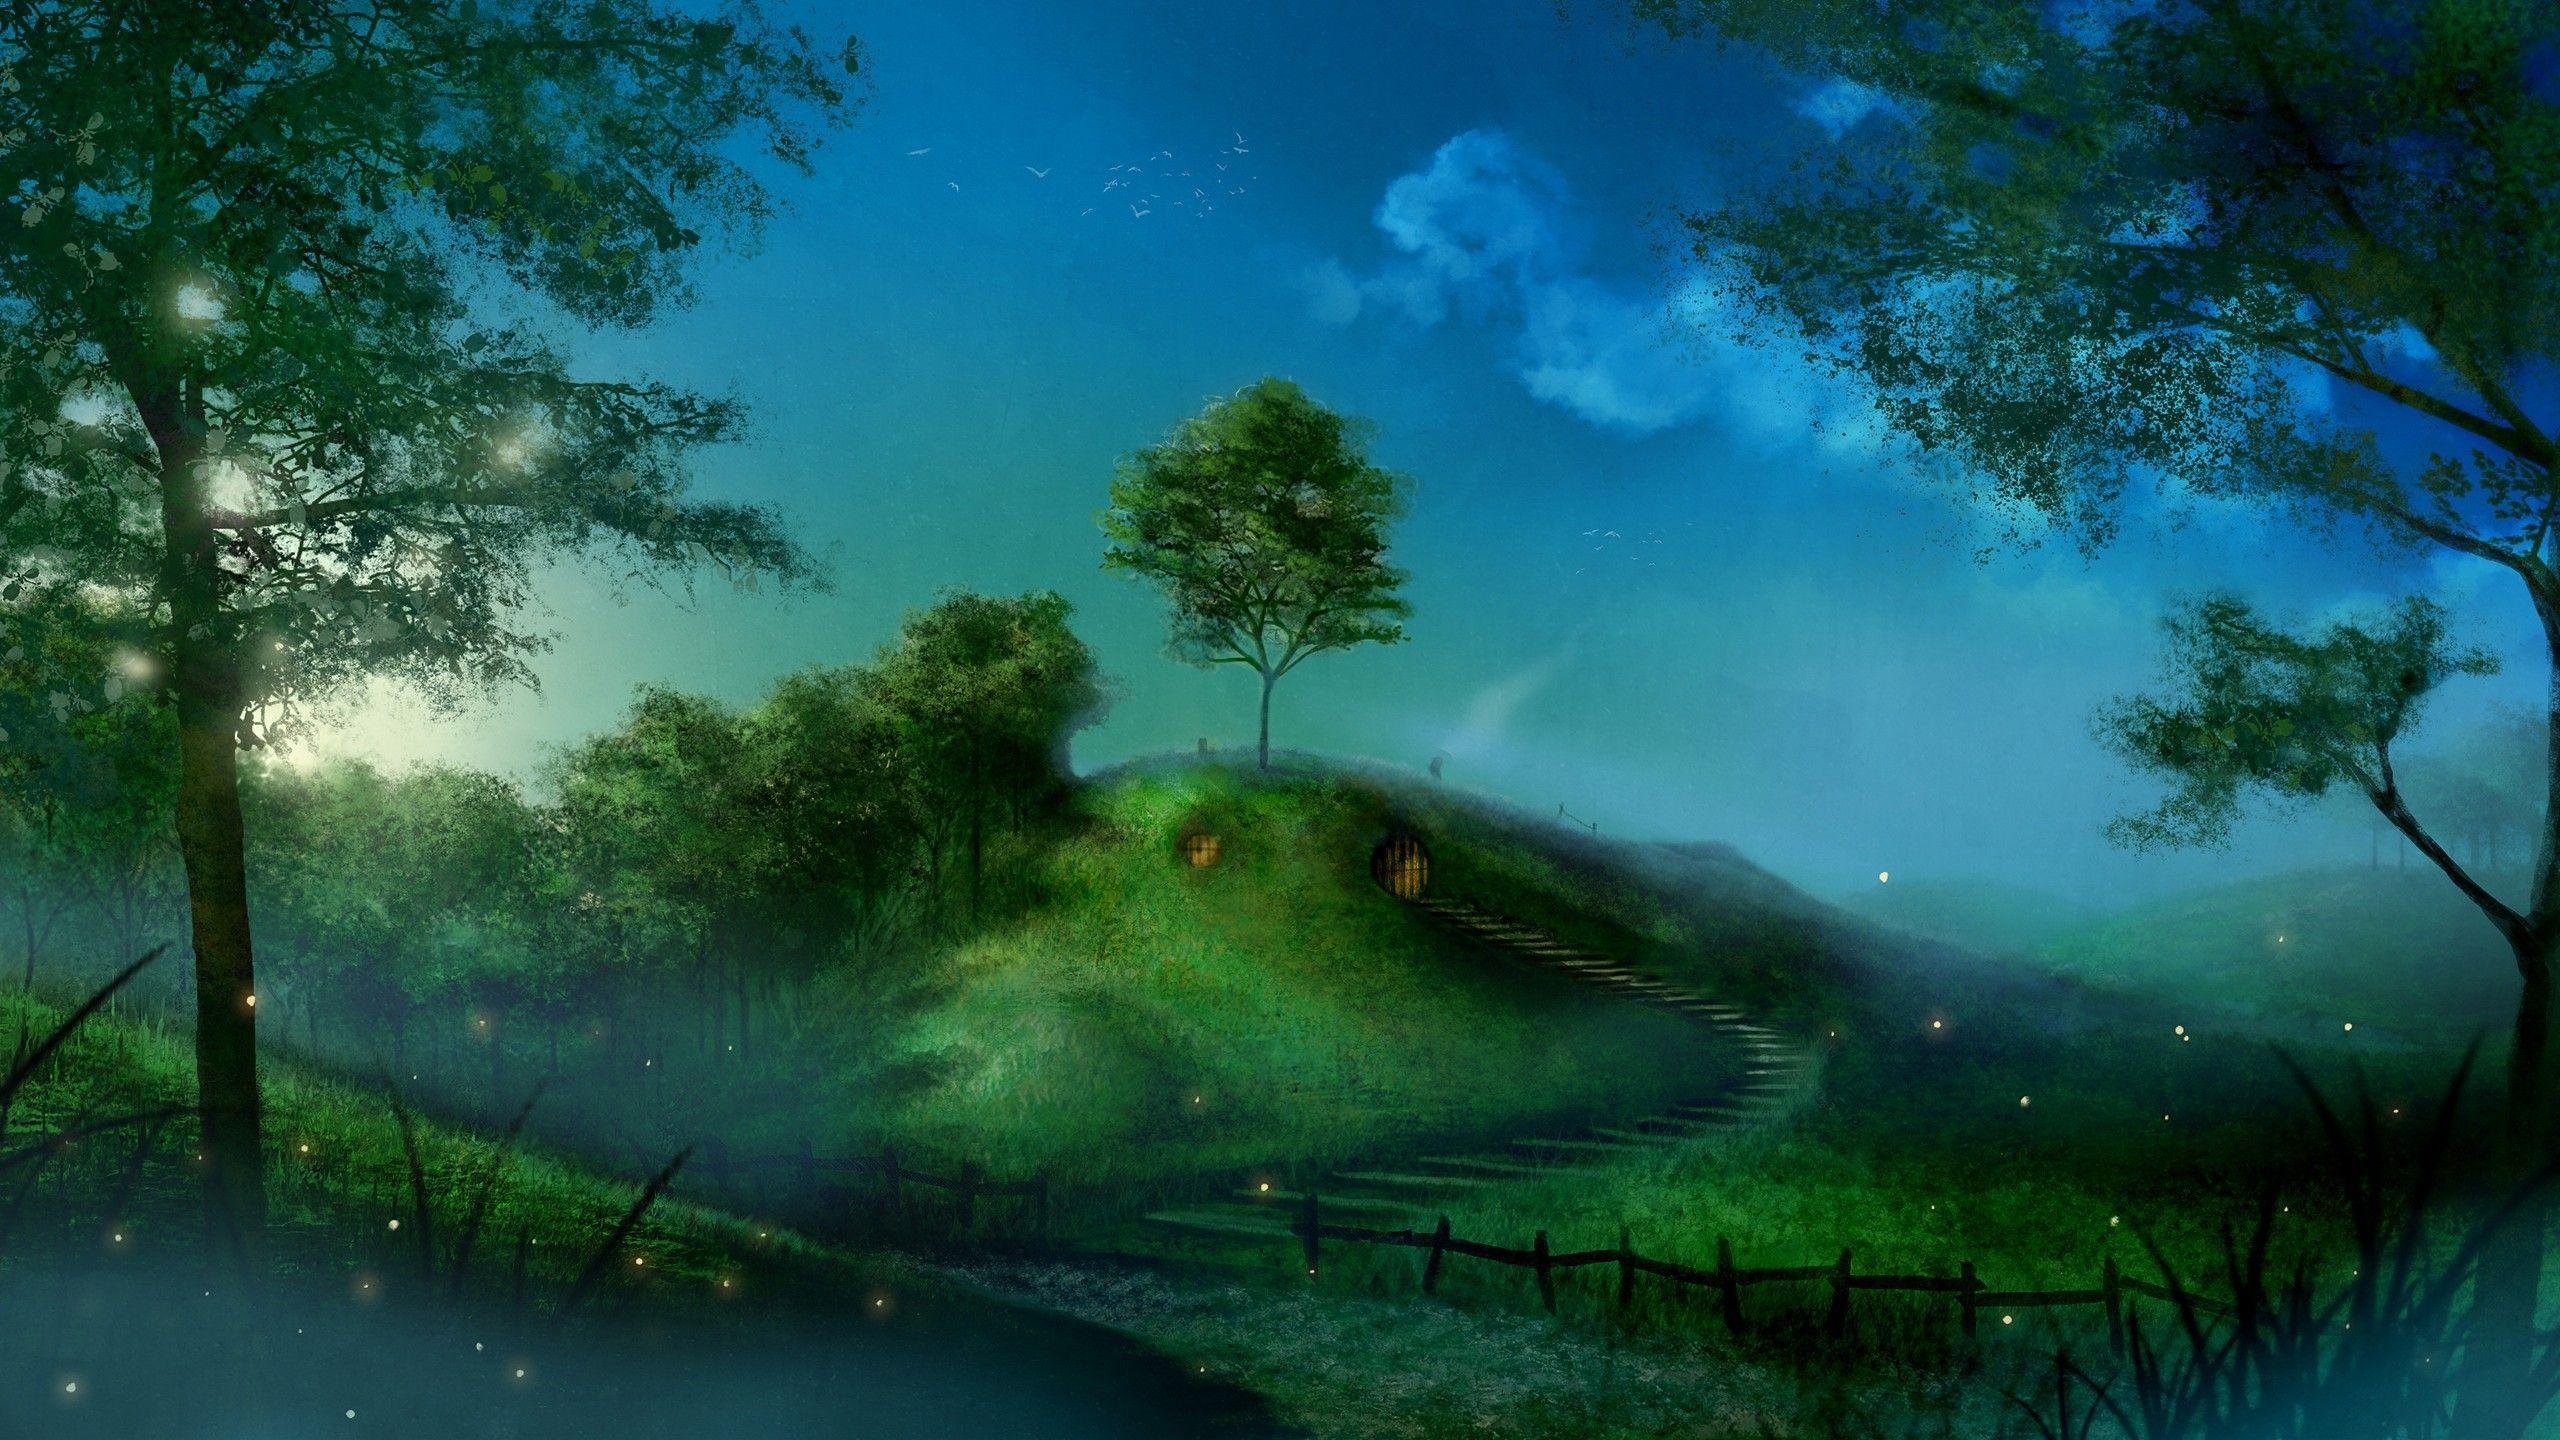 Fireflies Artwork Fictional Landscapes Shire Bag End 2560x1440 Artwork Landscapes Shire Bag